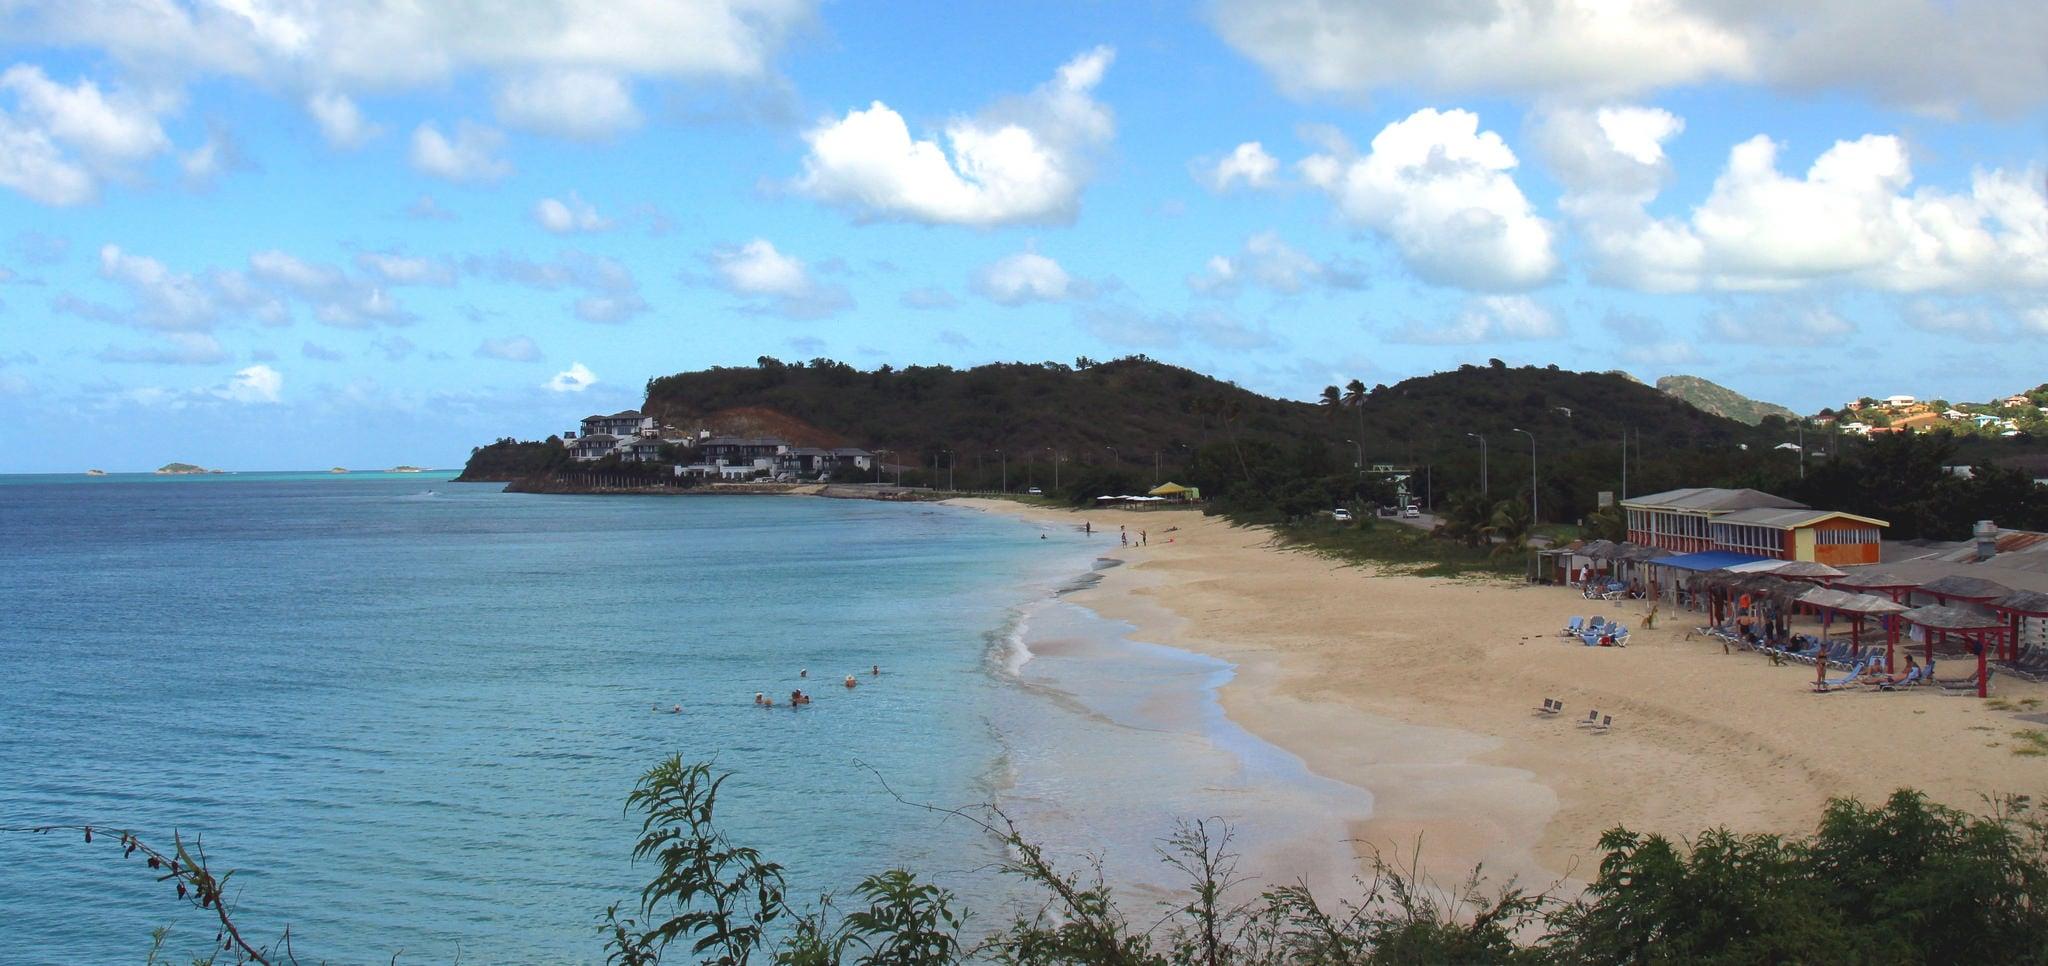 Dark Wood Beach の画像. ocean blue sky cloud beach water view sunny front cumulus caribbean konomark